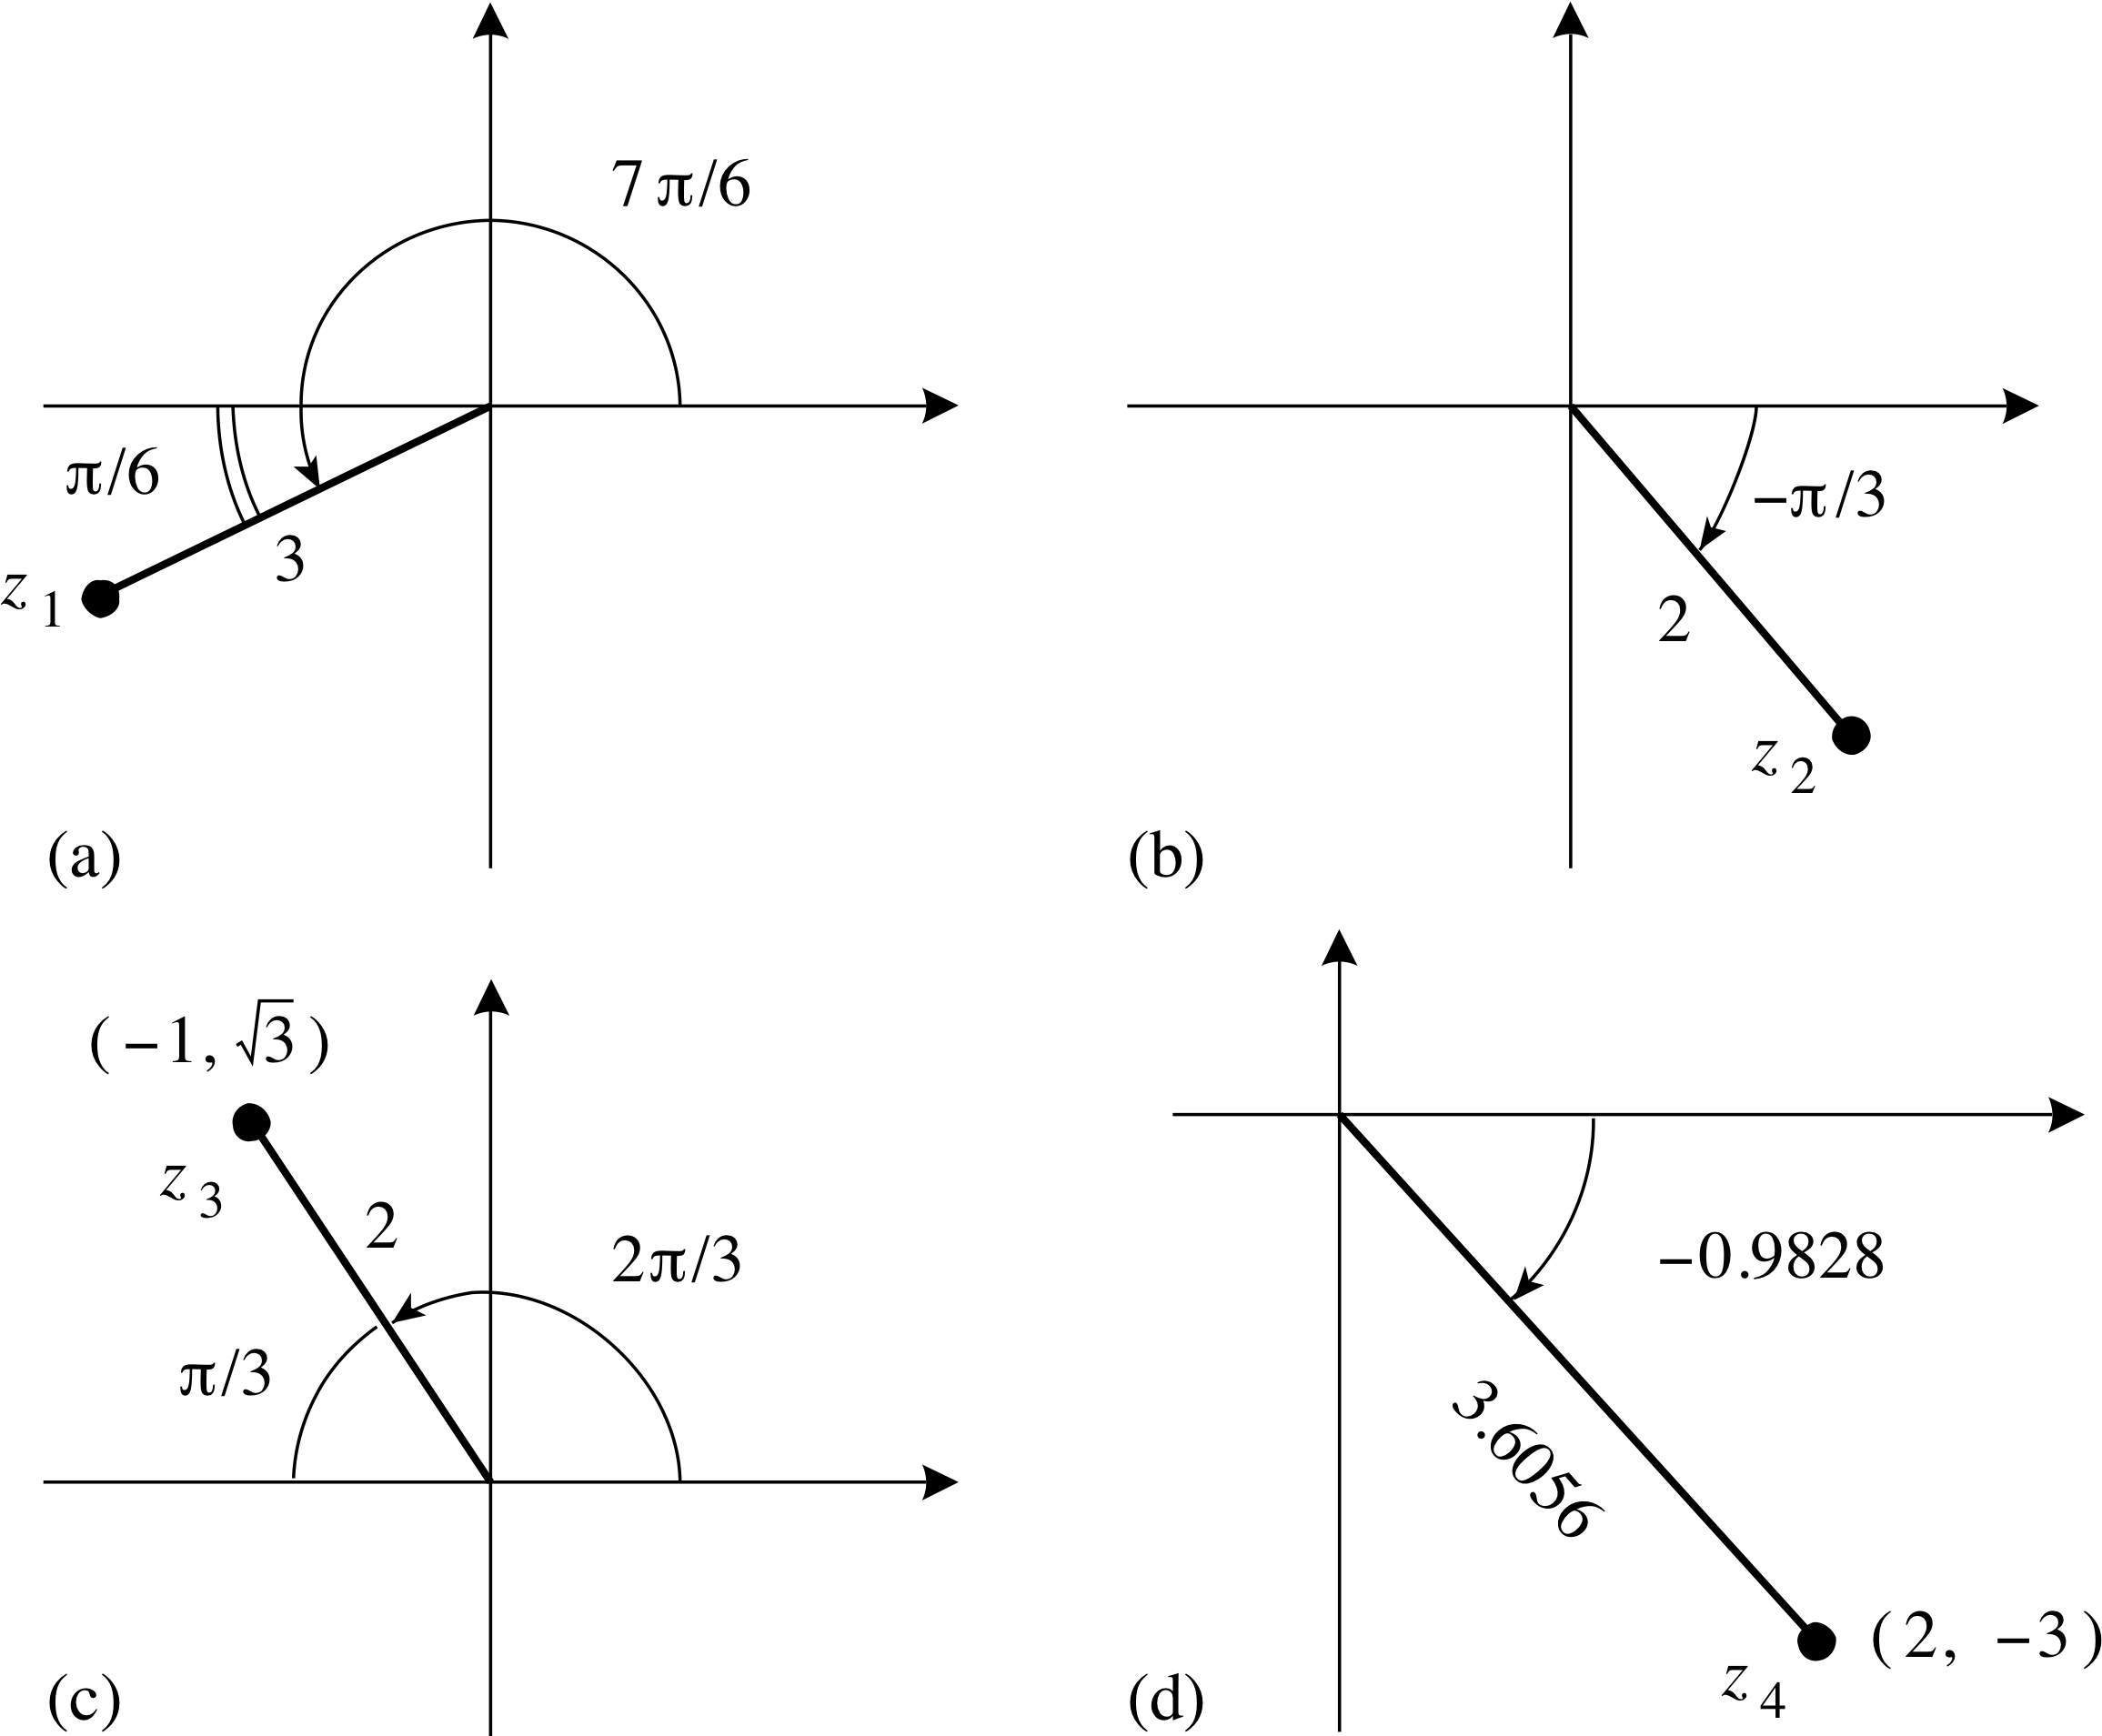 PPLATO | FLAP | MATH 3 2: Polar representation of complex